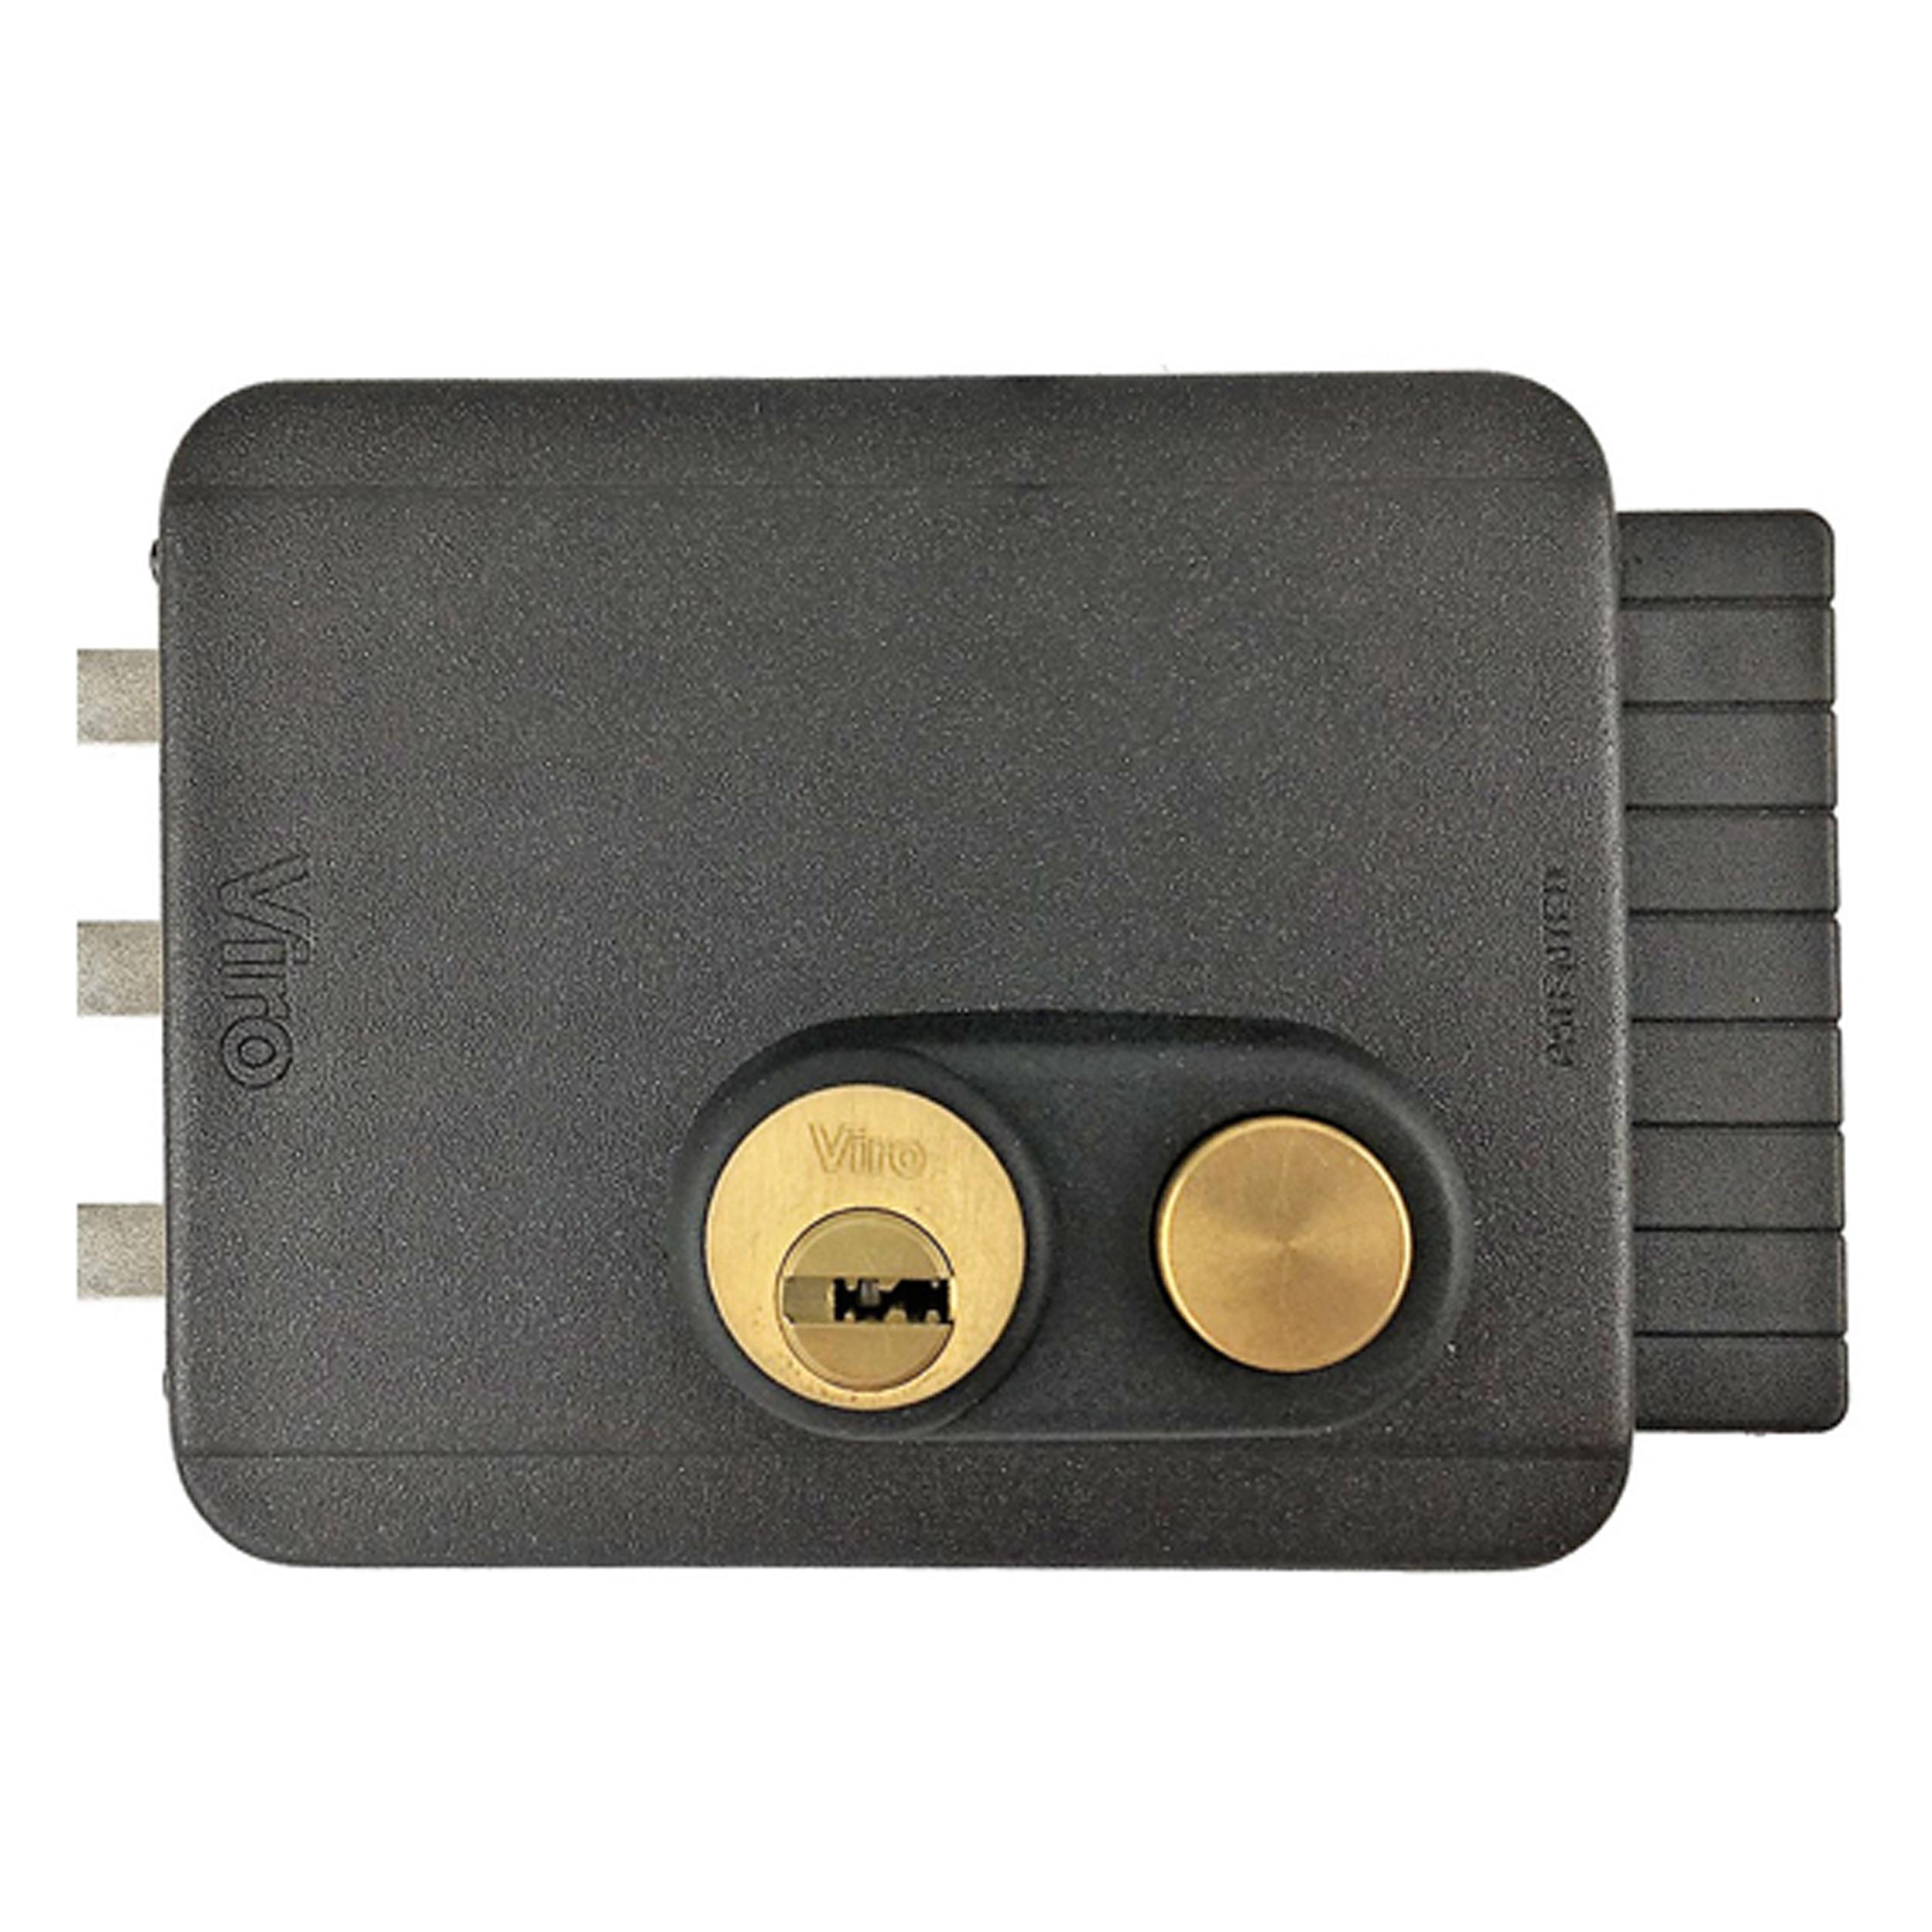 قفل برقی کامپیوتری ویرو مدل BLOCK-OUT L چپ باز شو